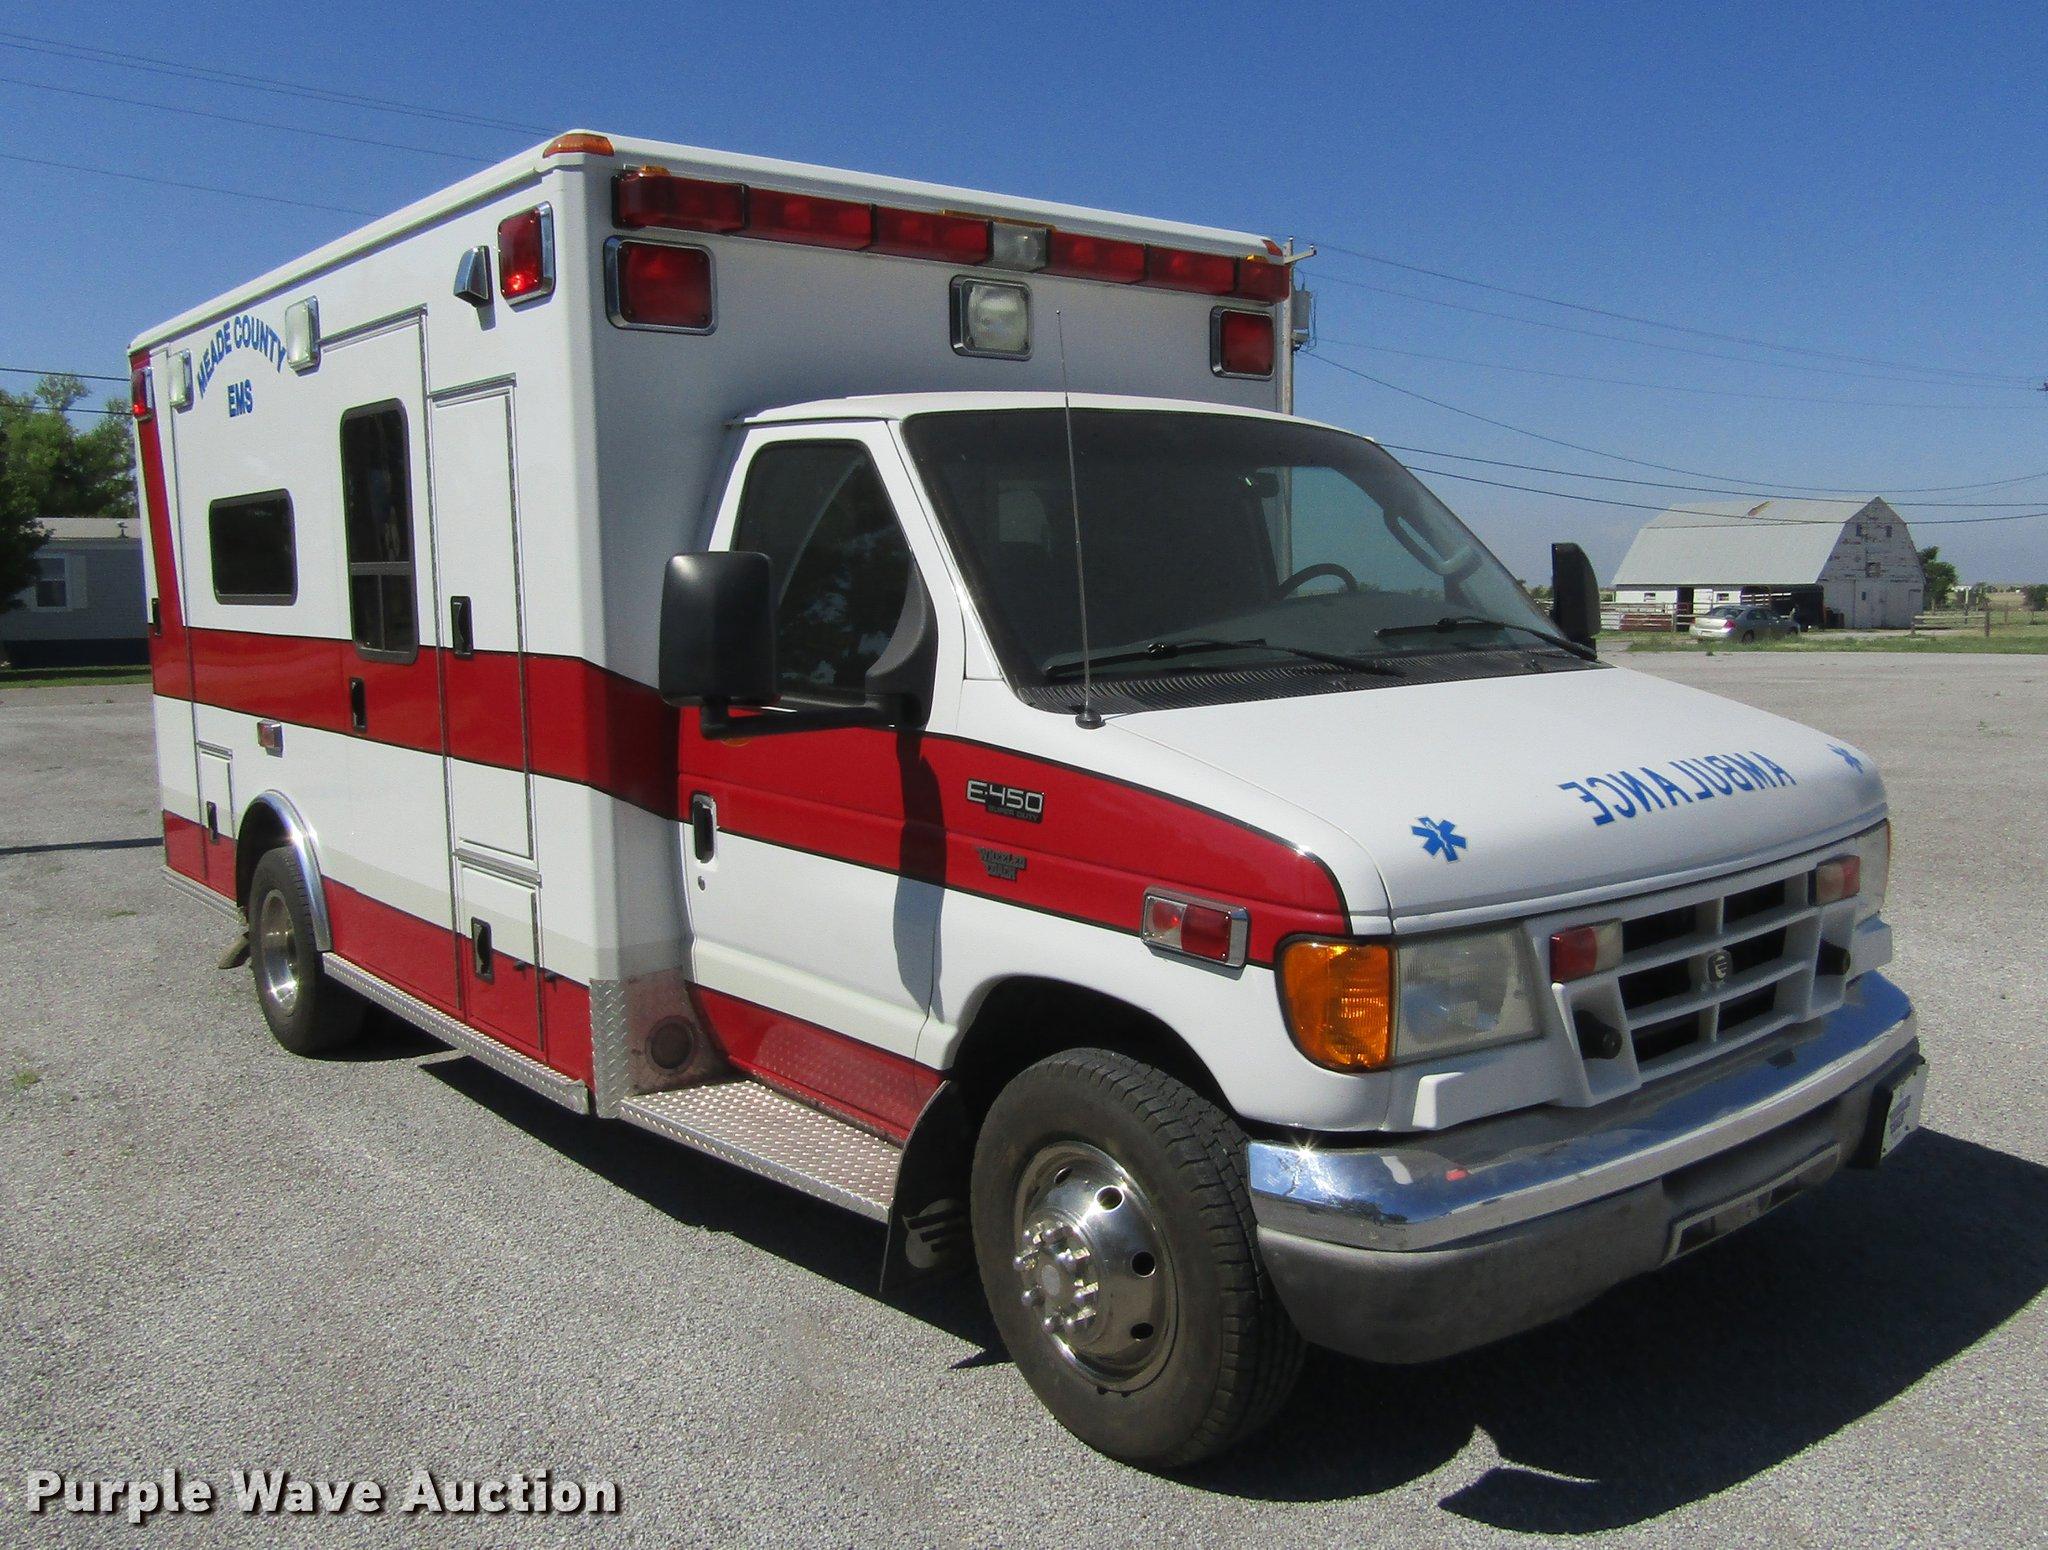 Wiring Diagram 2003 Ford E 450 Ambulance Electrical Schematics Diagrams For Econoline E450 Super Duty Item Dd5683 1985 F 350